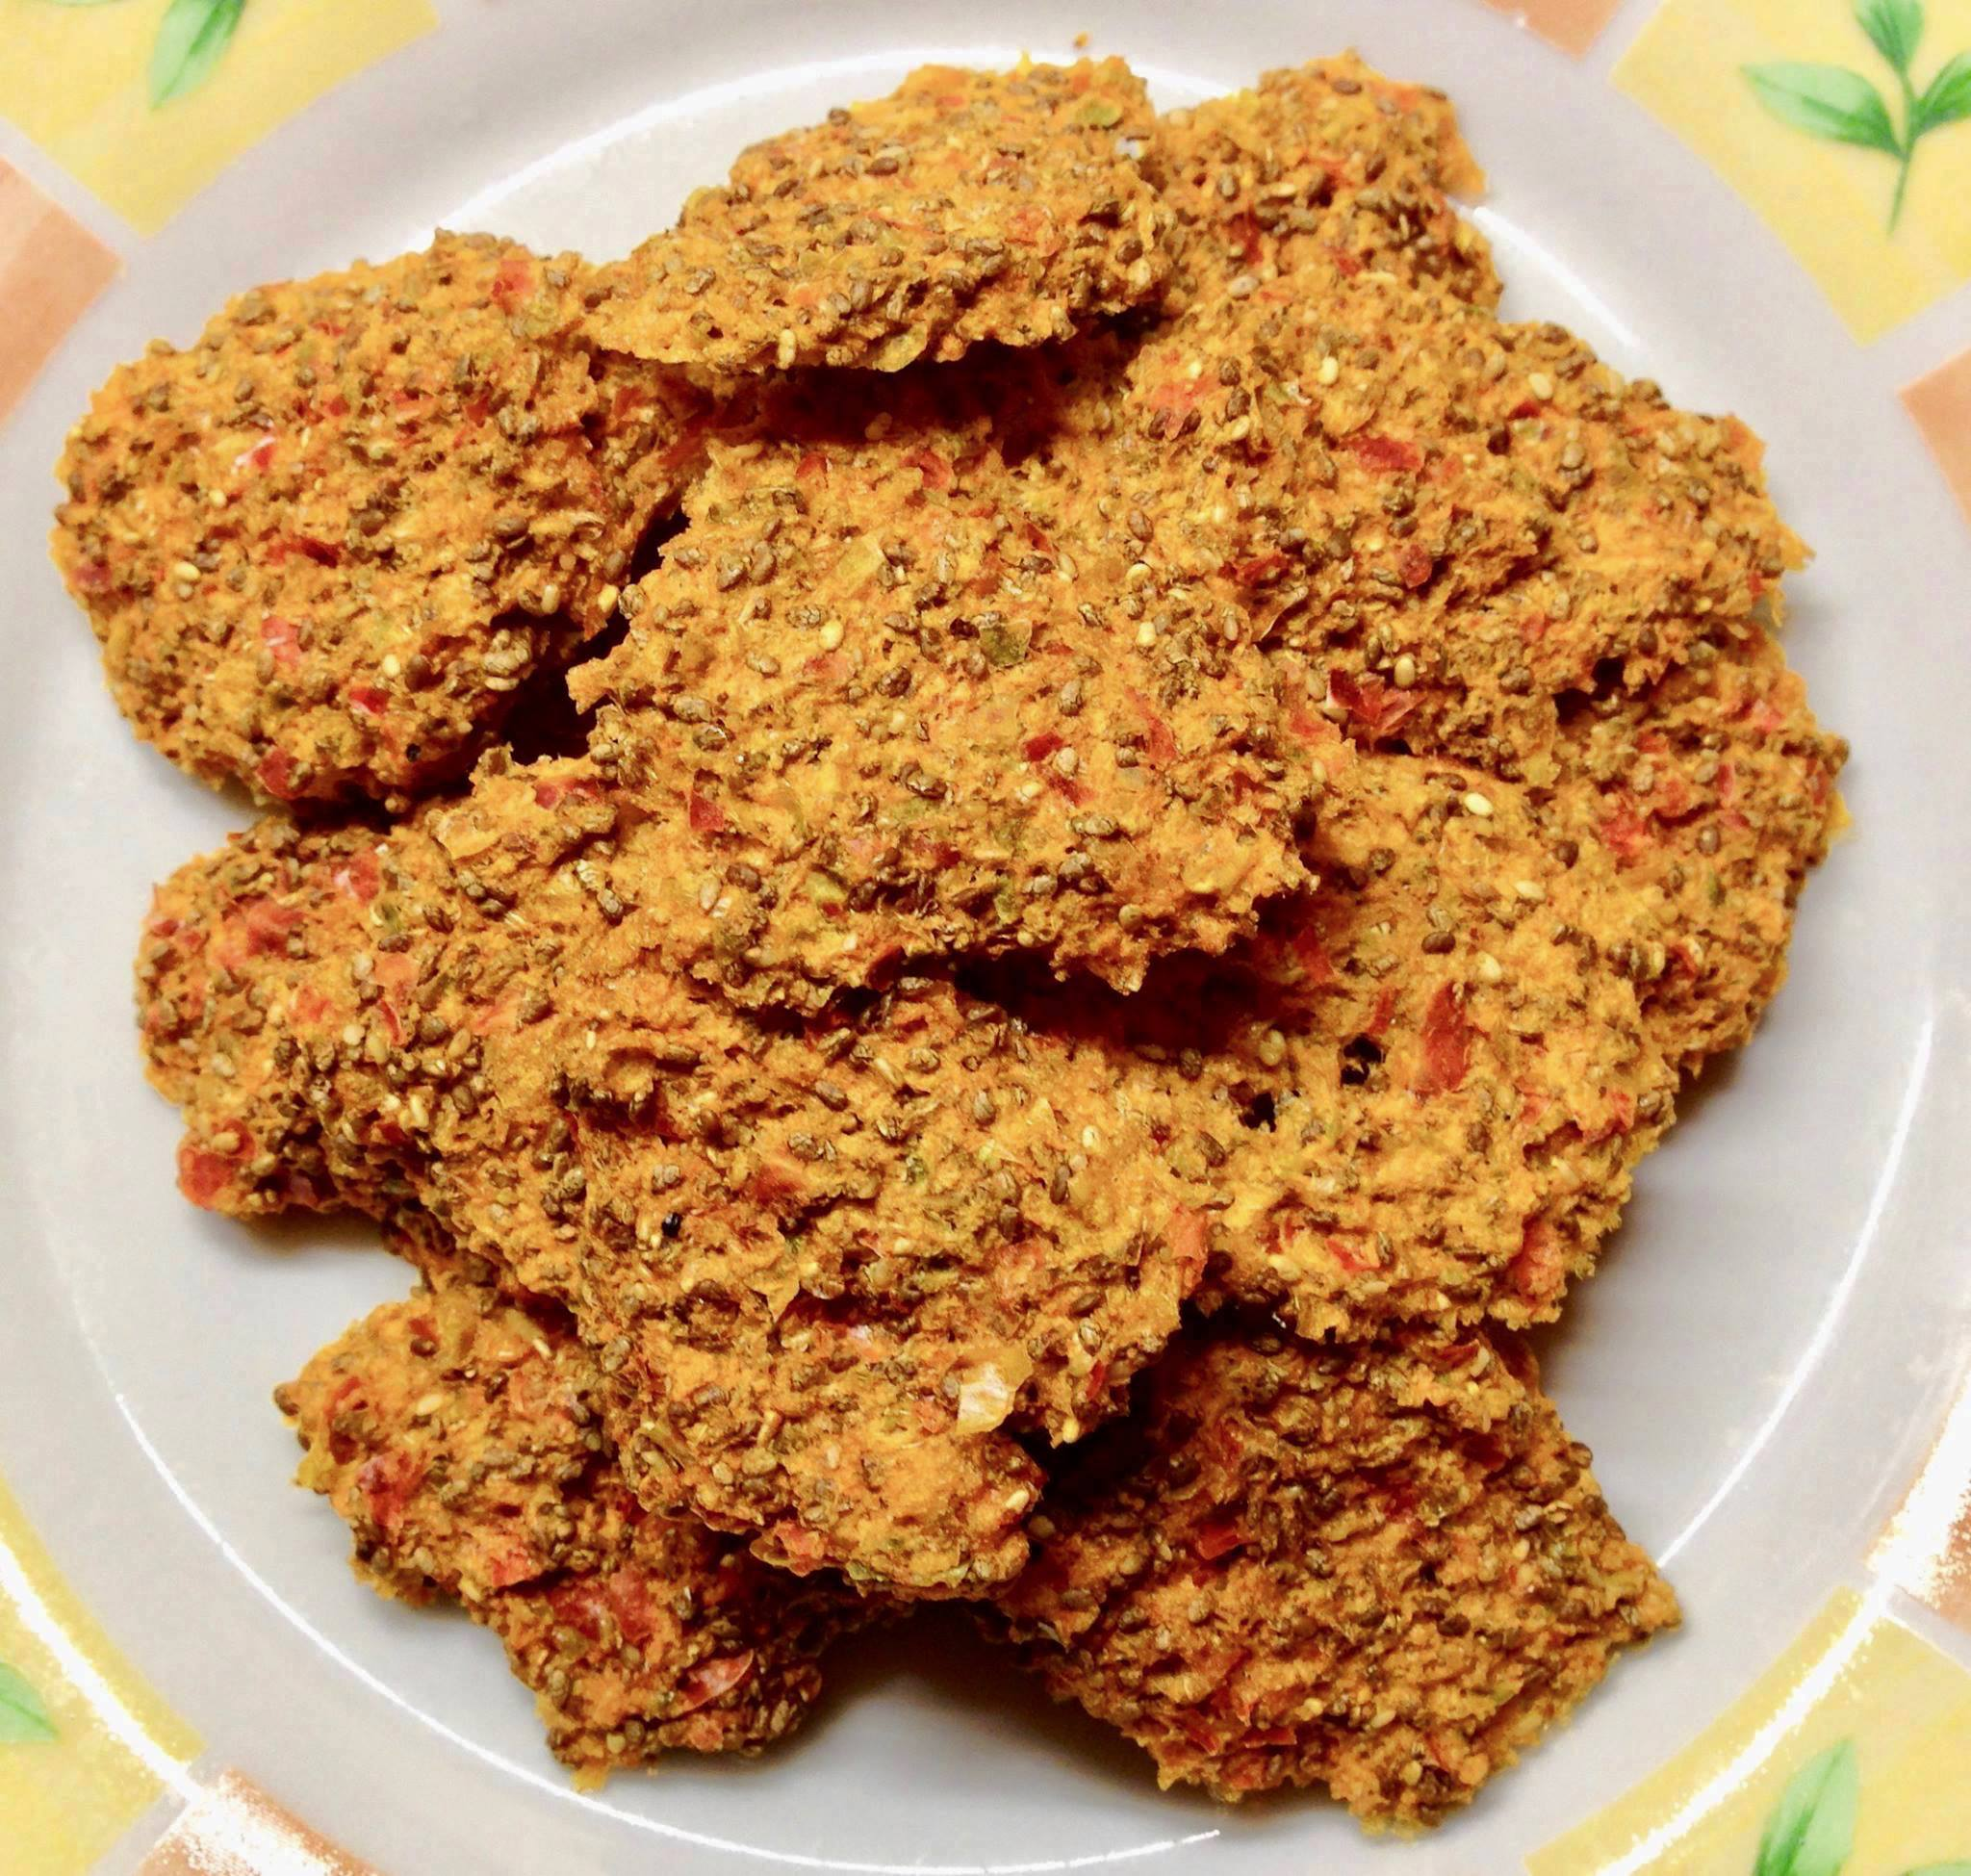 Bild 3: Paprika-Chia-Gemüsecracker